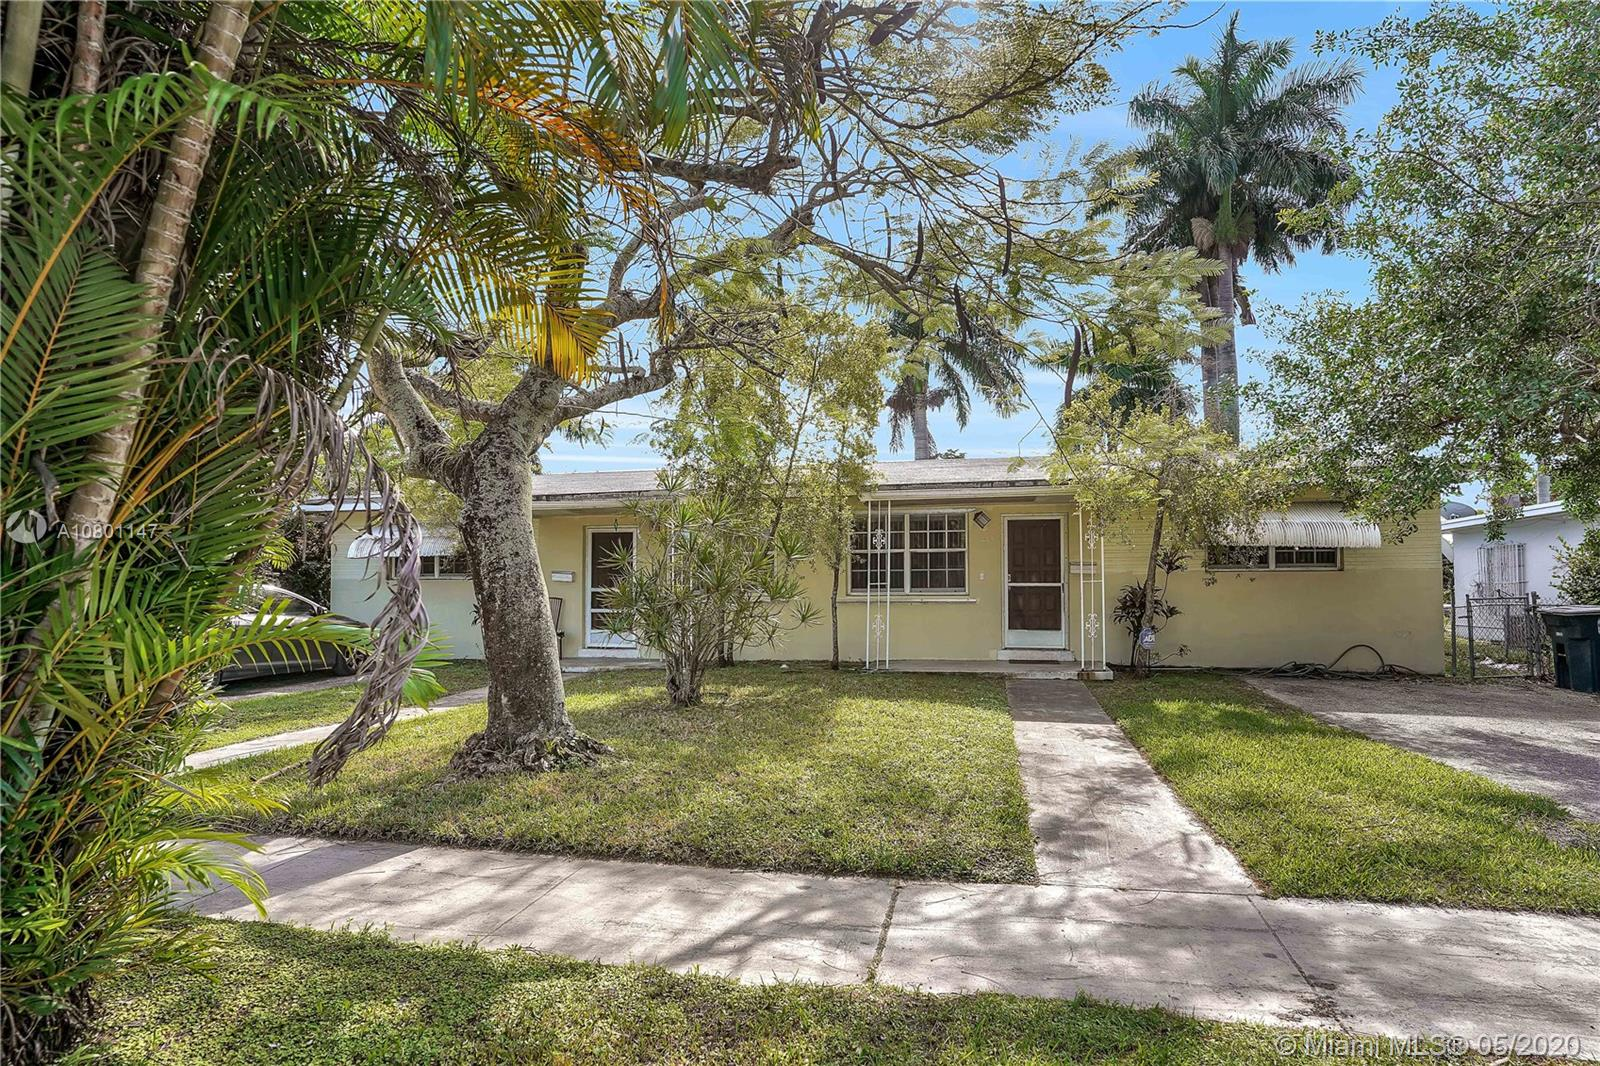 446 NE 141st St, Miami Shores, Florida